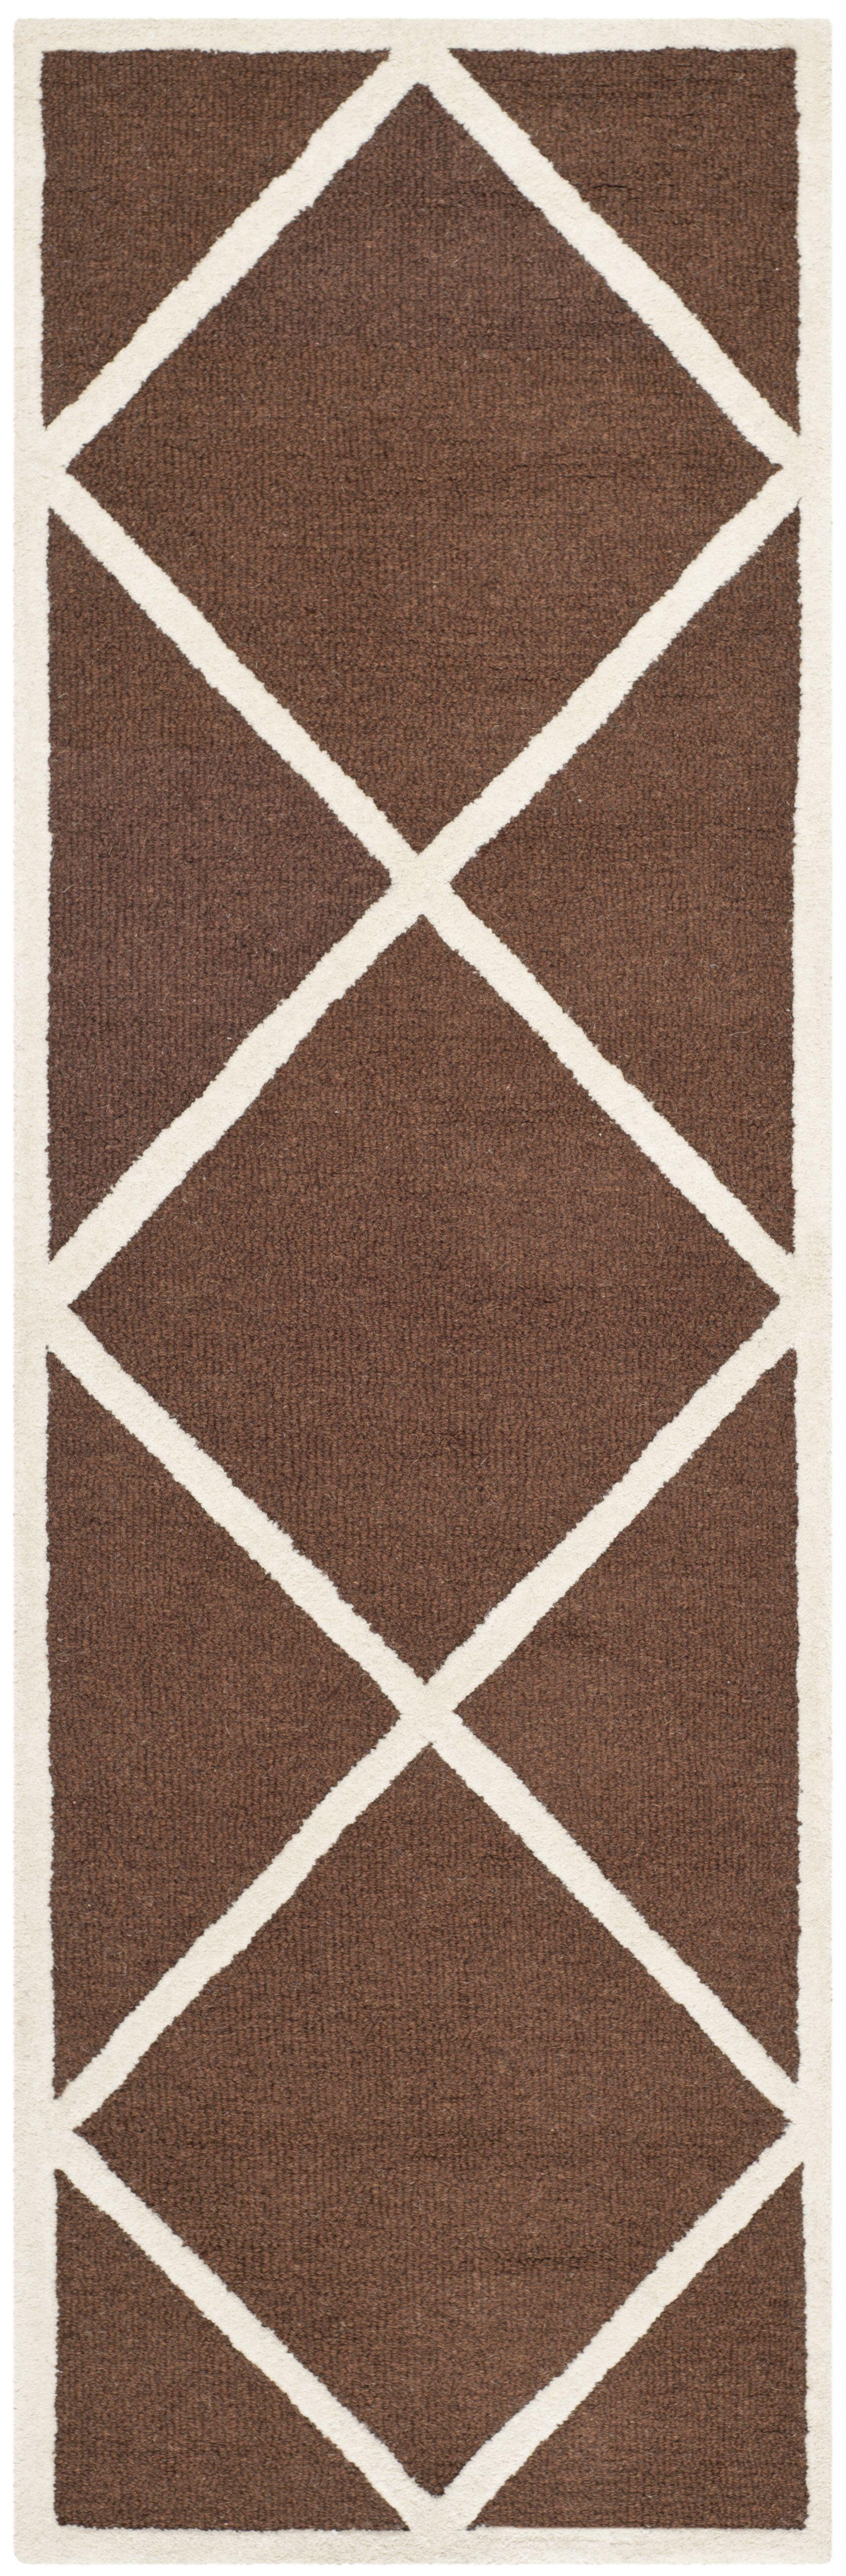 Darla Hand-Tufted Wool Dark Brown/Ivory Area Rug Rug Size: Runner 2'6